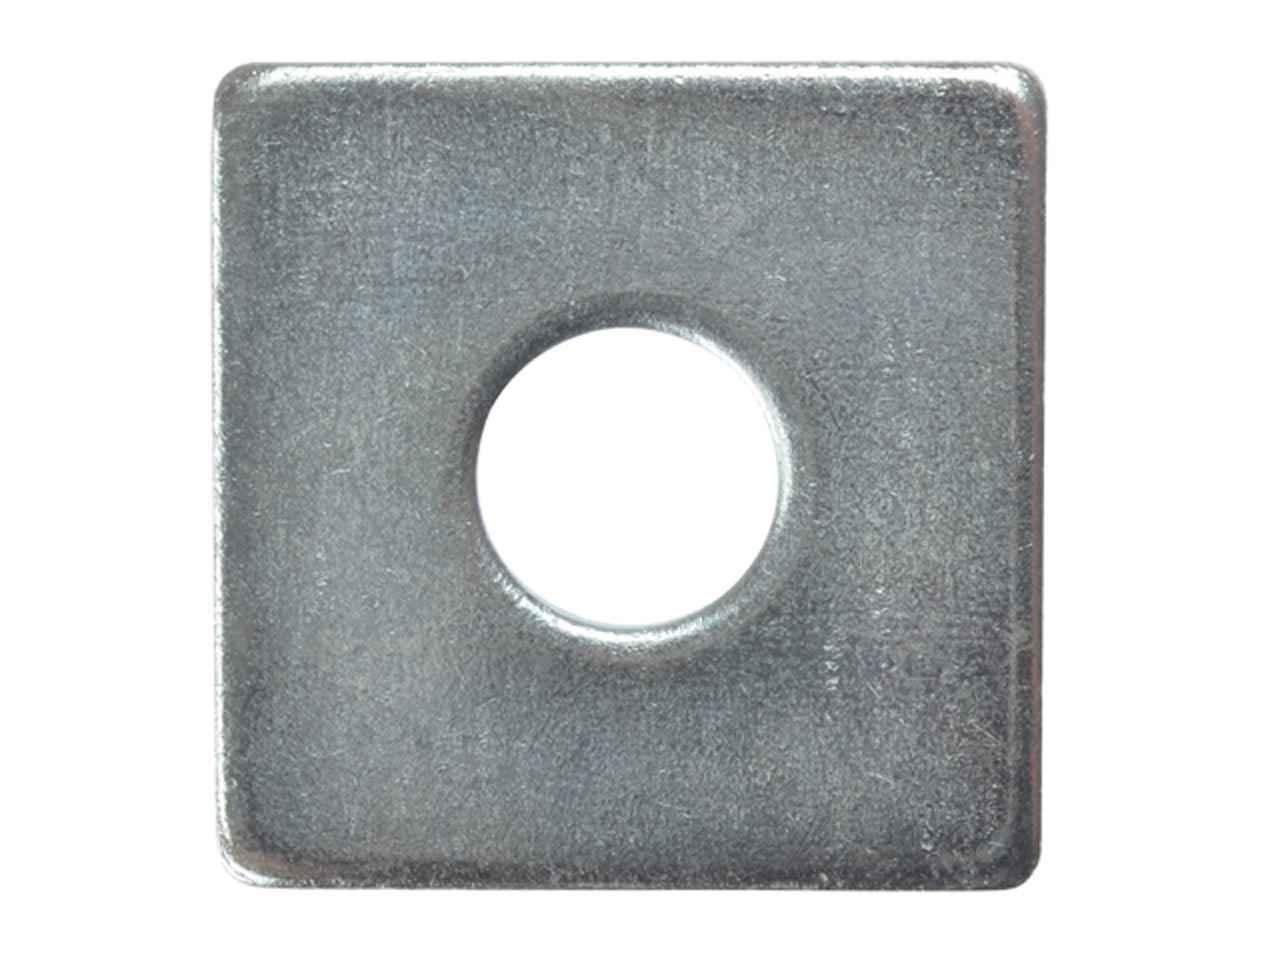 sc 1 st  FFX & Forgefix 10SQPL5016 M16 Square Plate Washer ZP 50 x 50 x 16mm Bag 10